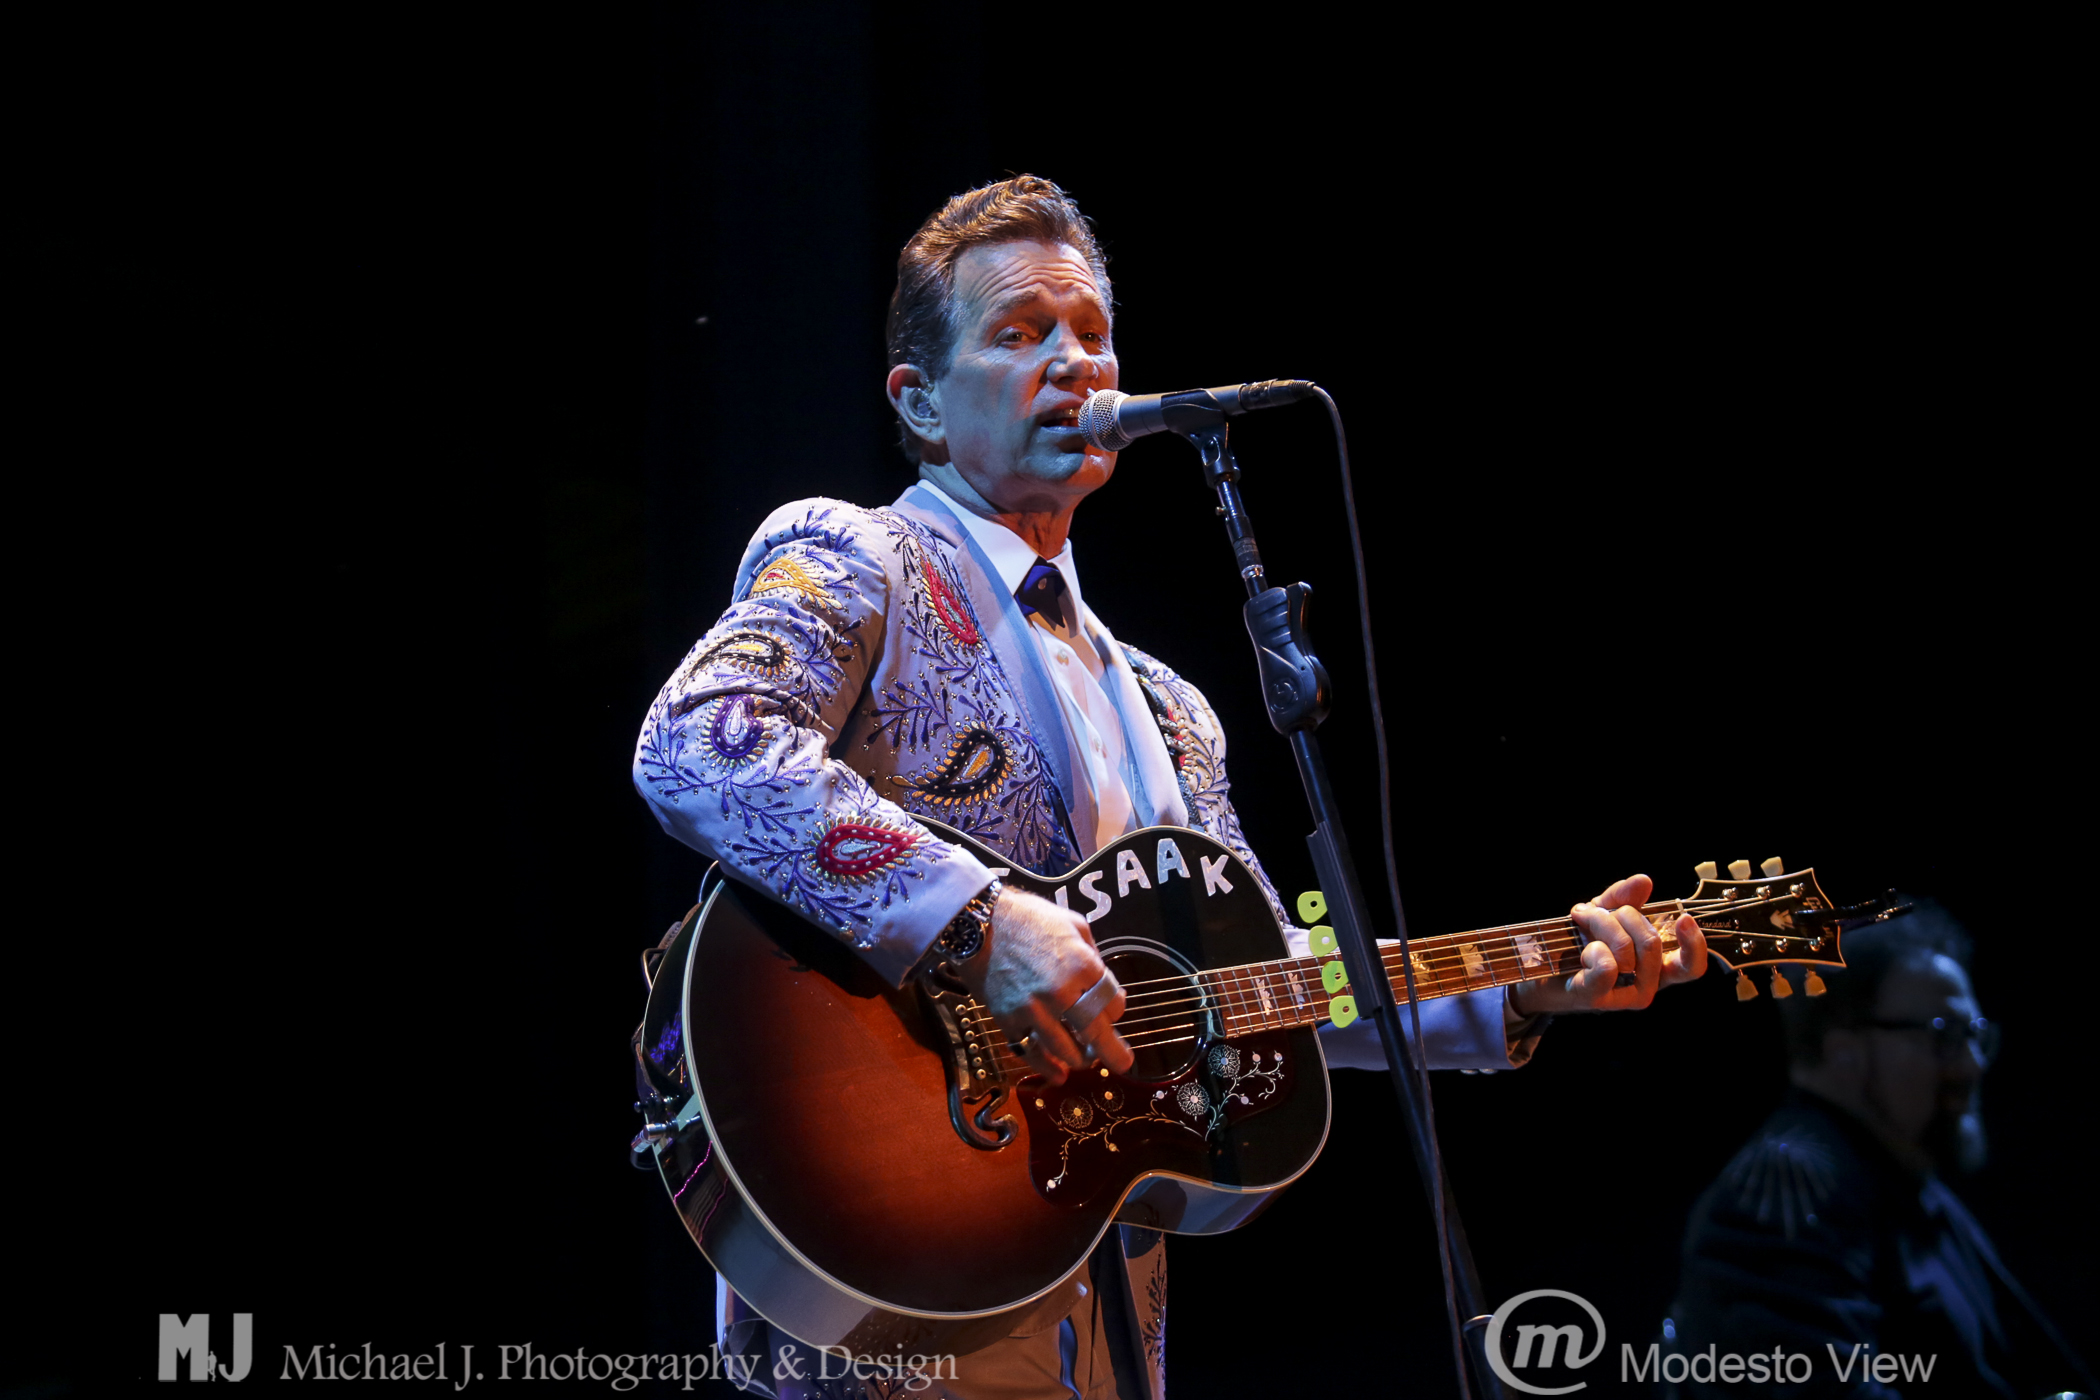 Chris Issac Concert image